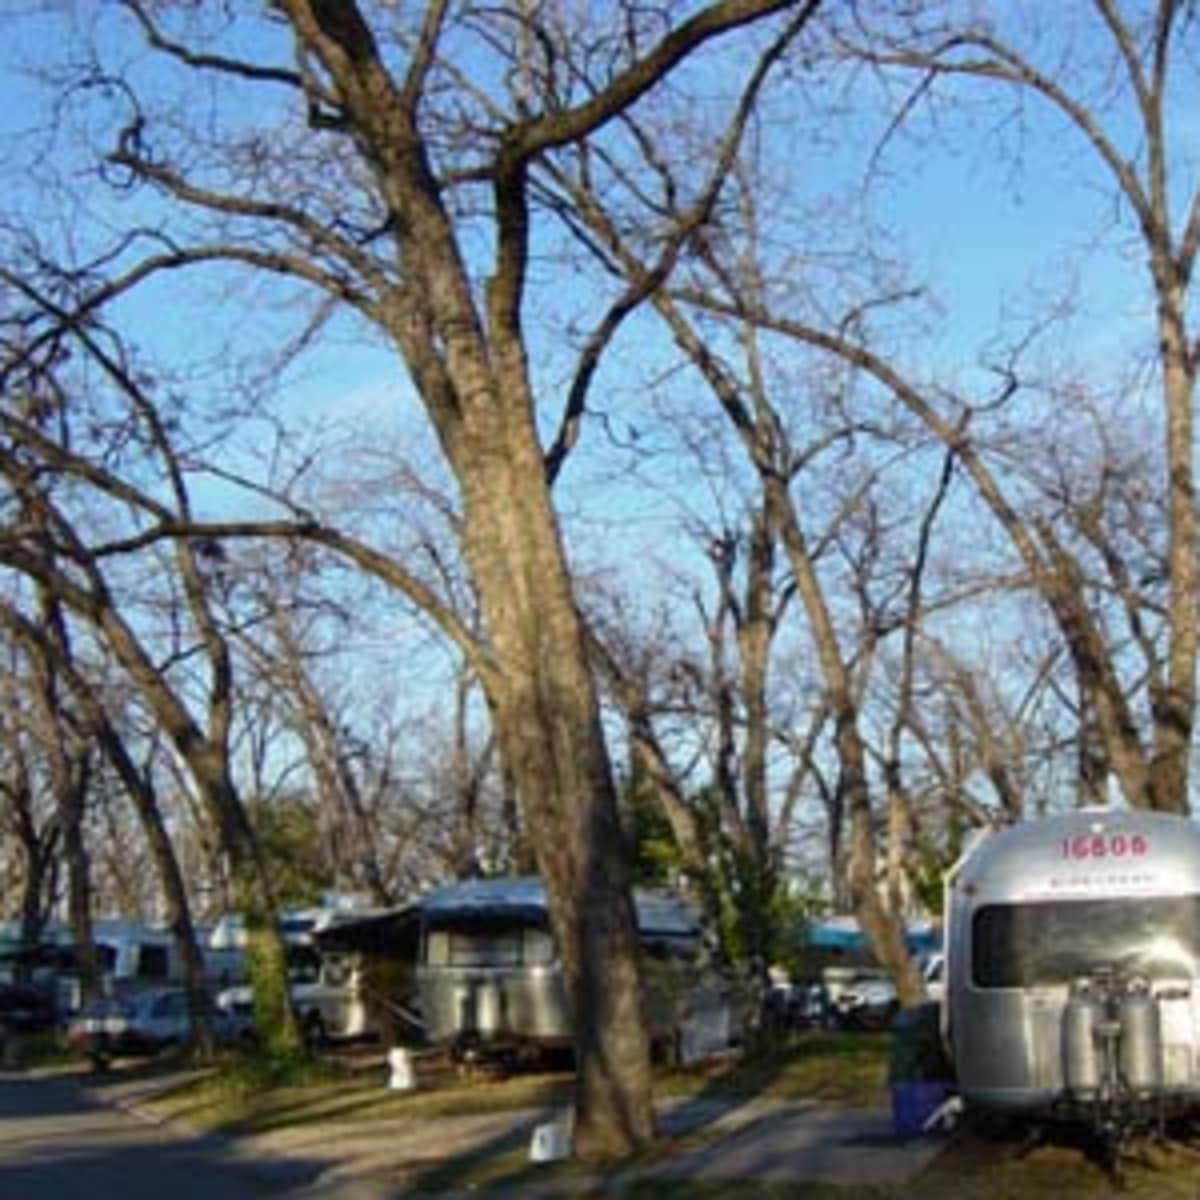 Austin_photo: places_outdoors_pecan grove rv park_trailers